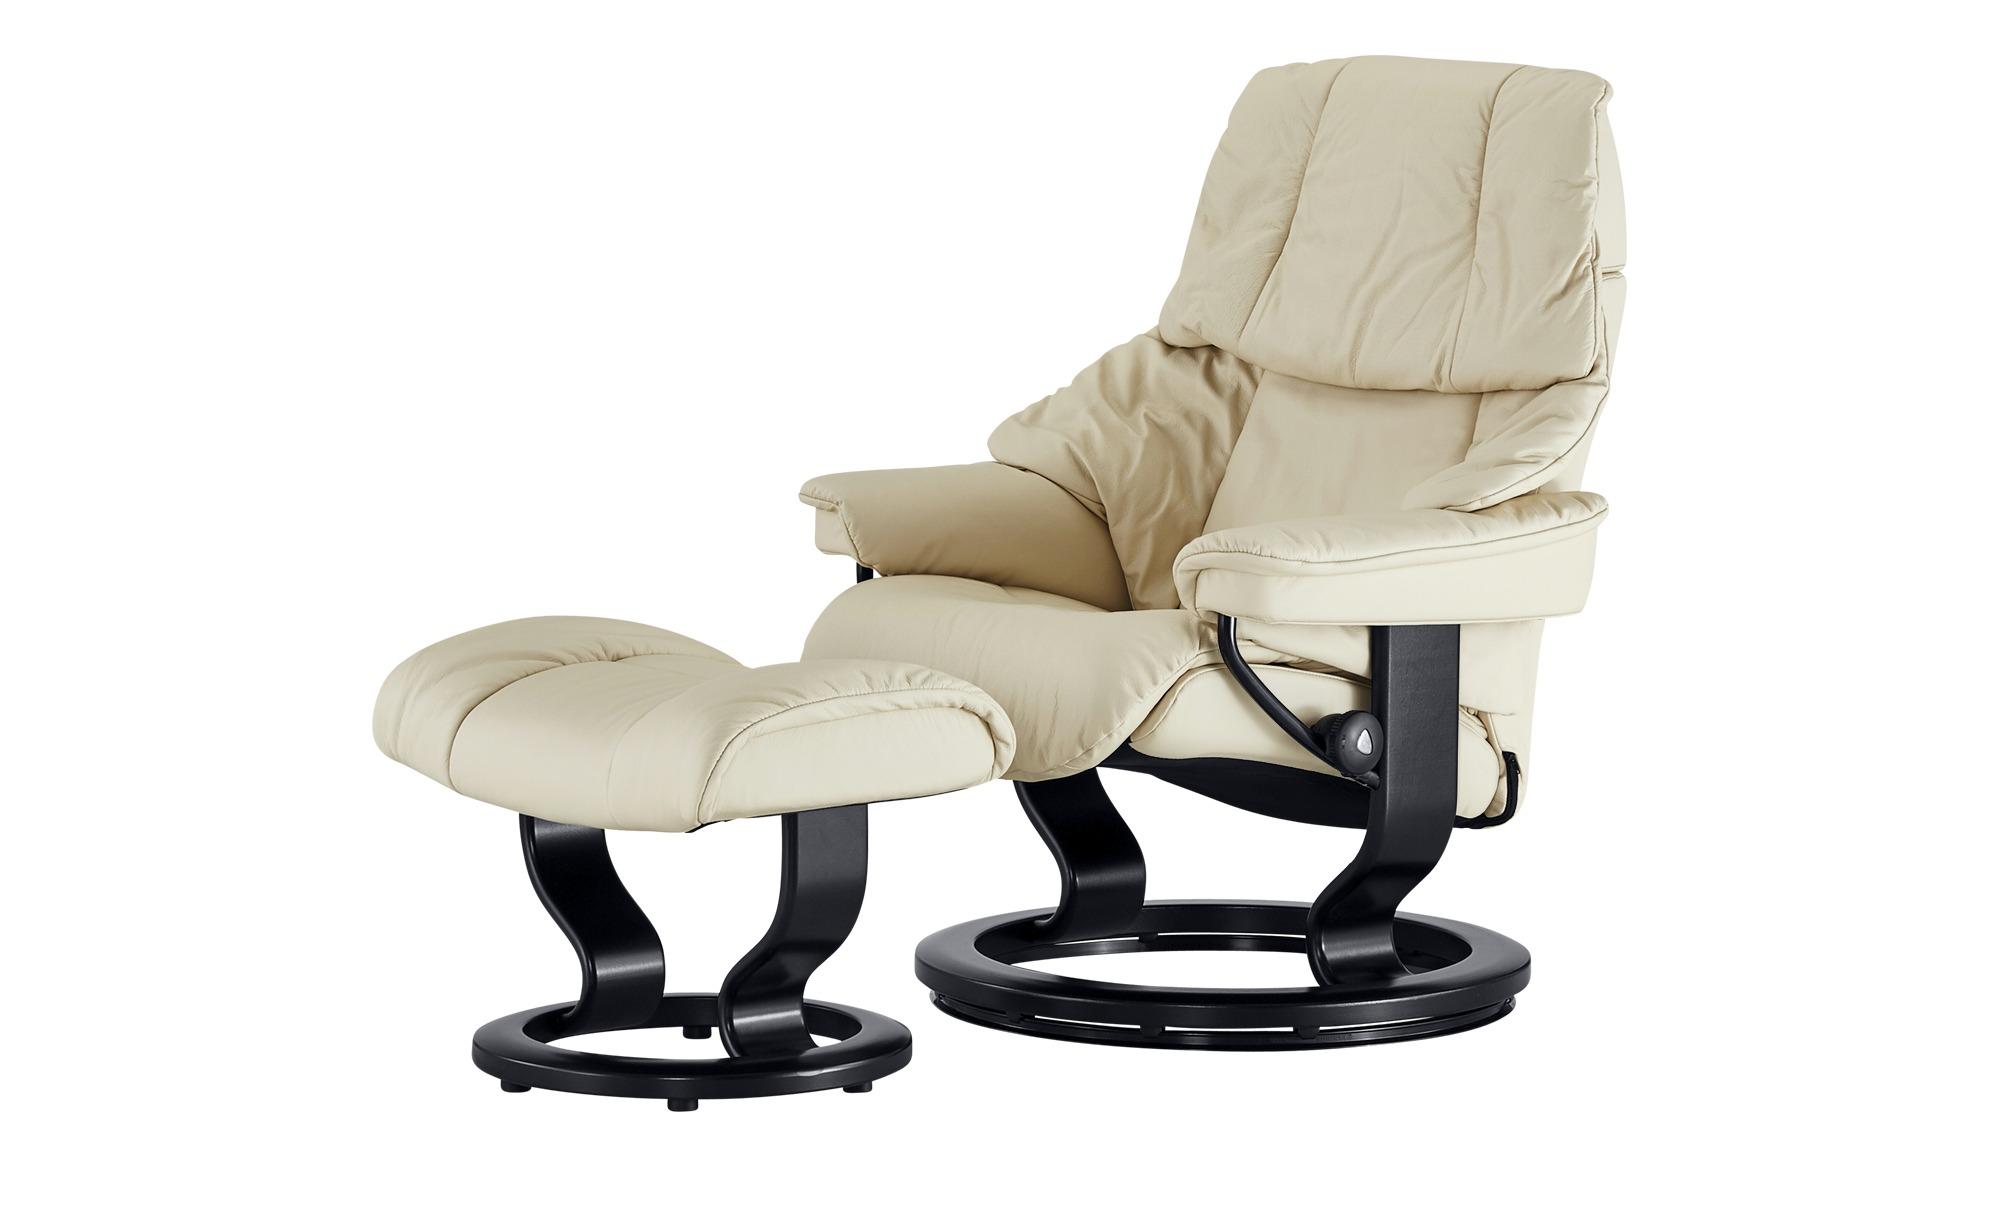 Stressless Relaxsessel mit Hocker creme - Leder Reno S ¦ creme ¦ Maße (cm): B: 75 H: 106 T: 75 Polstermöbel > Sessel > Fernsehsessel - Höffner